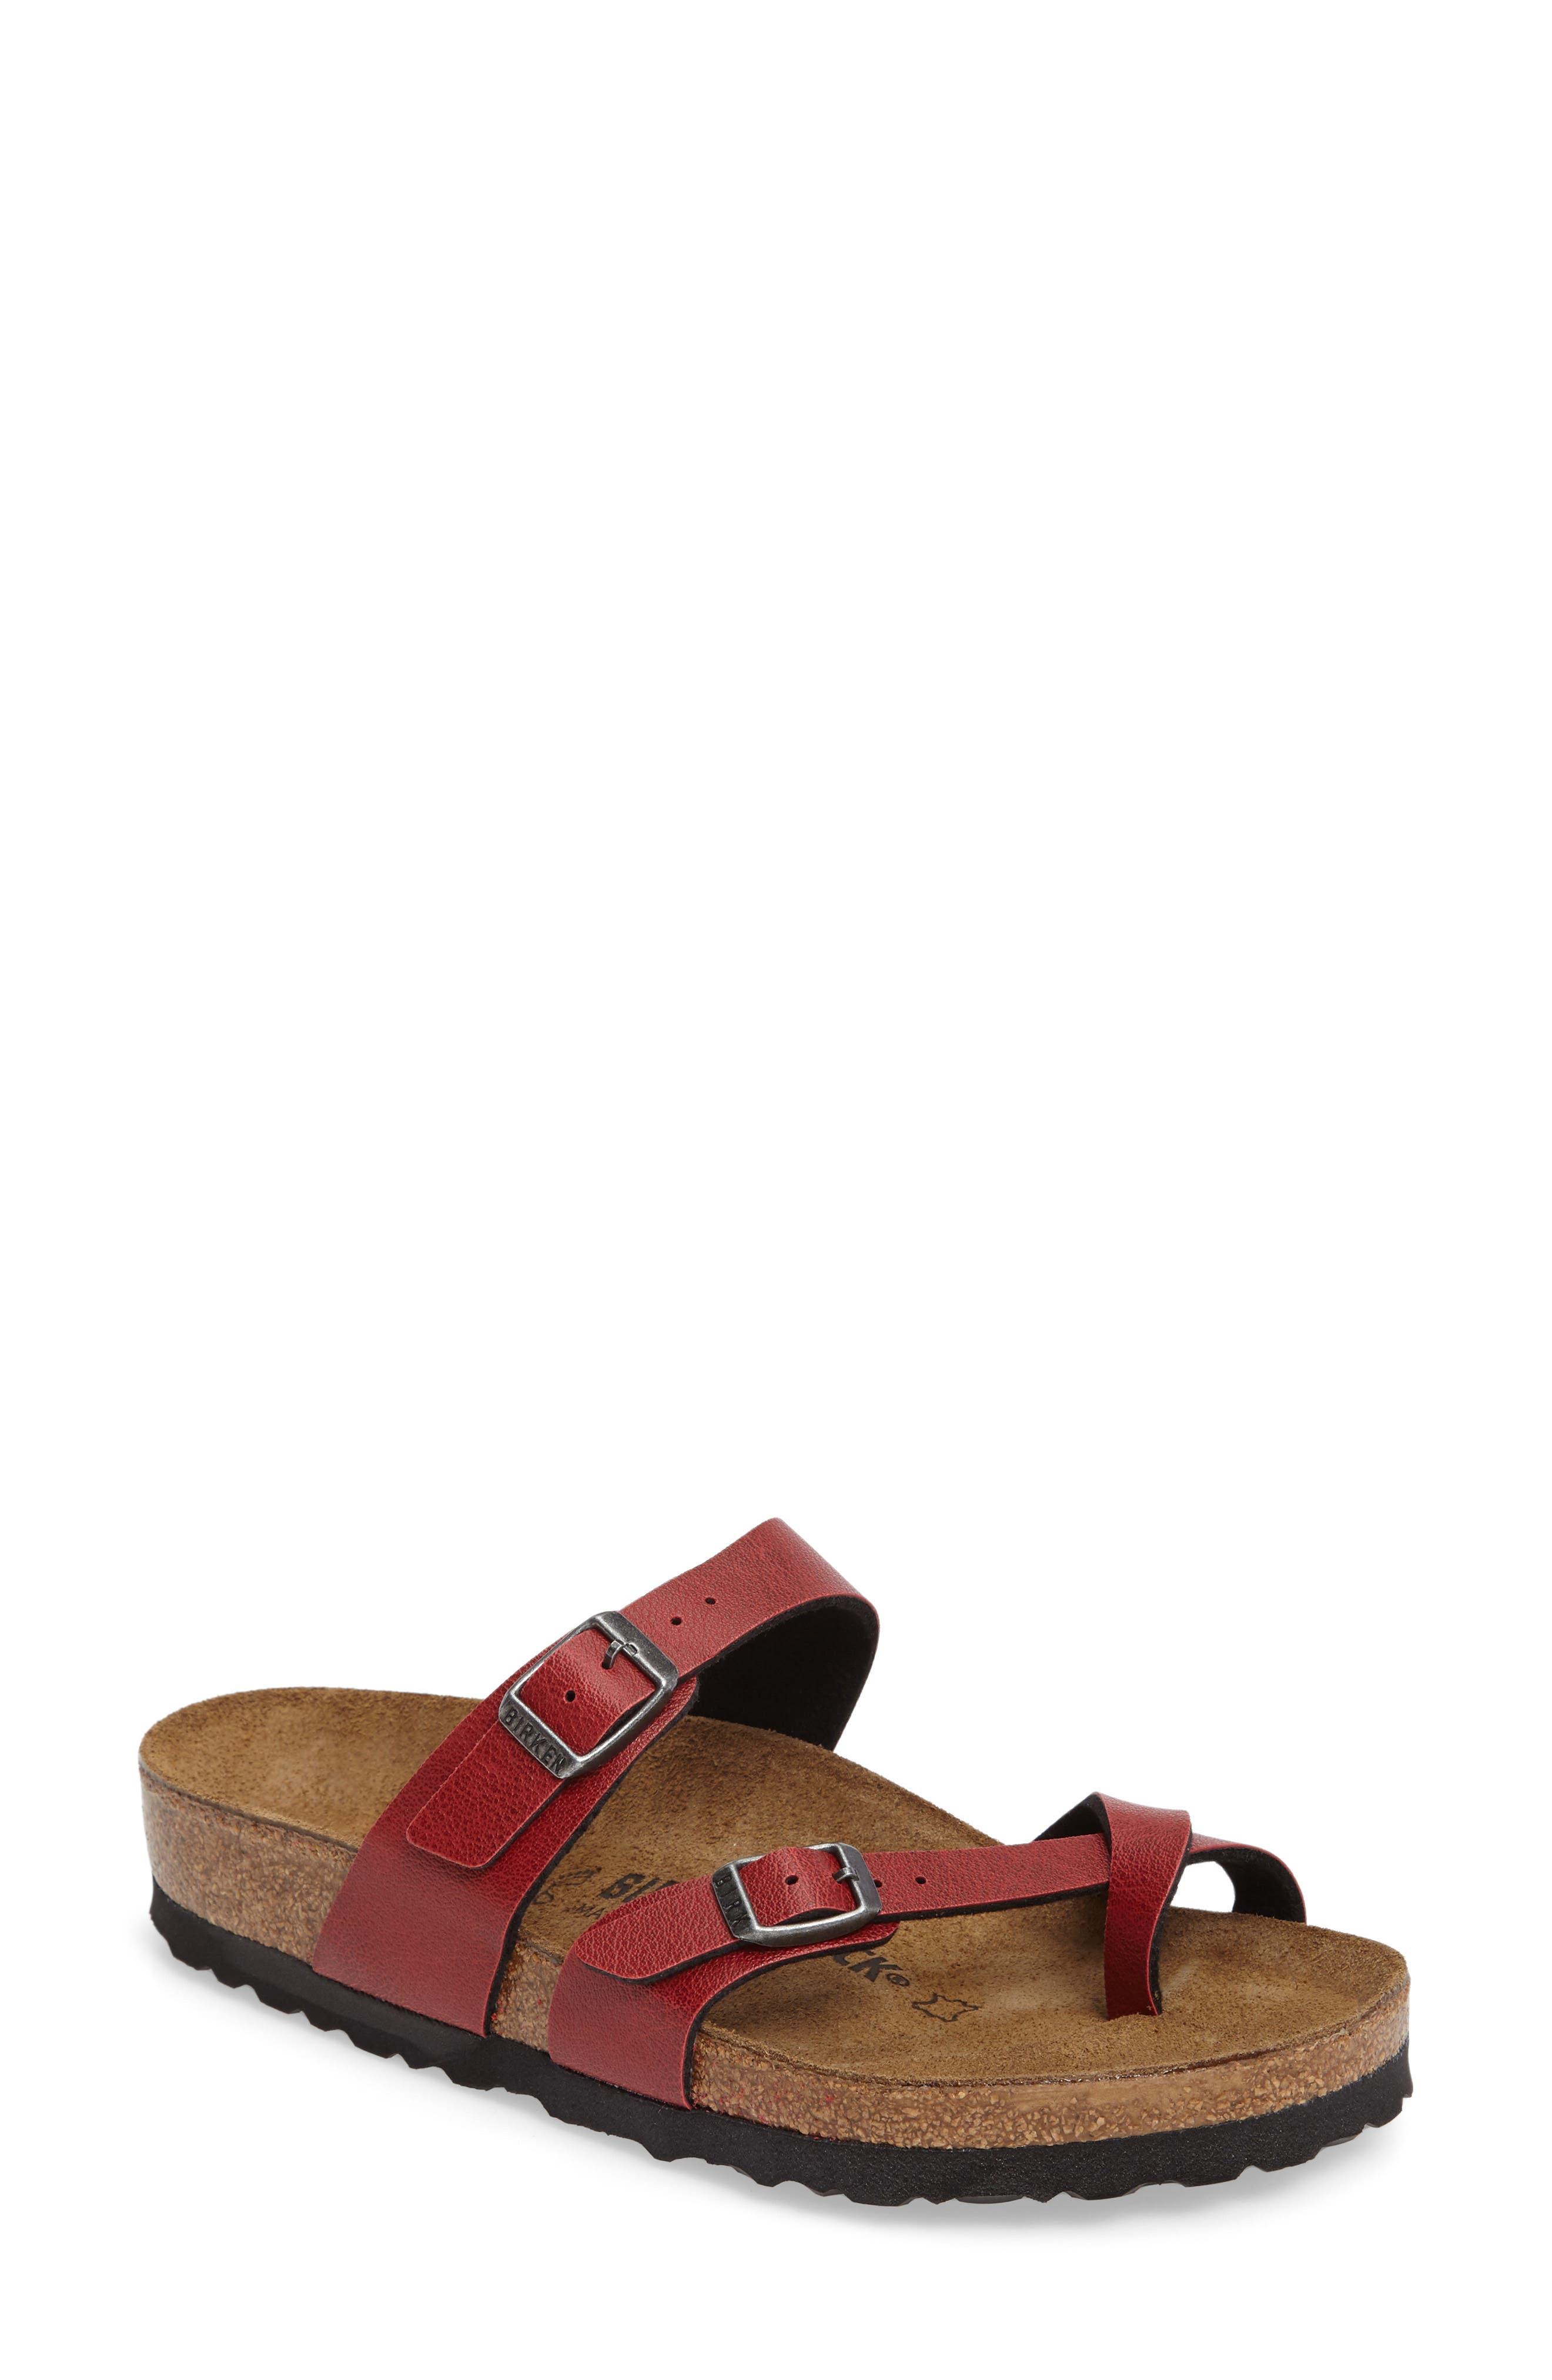 'Mayari' Birko-Flor<sup>™</sup> Sandal,                             Main thumbnail 21, color,